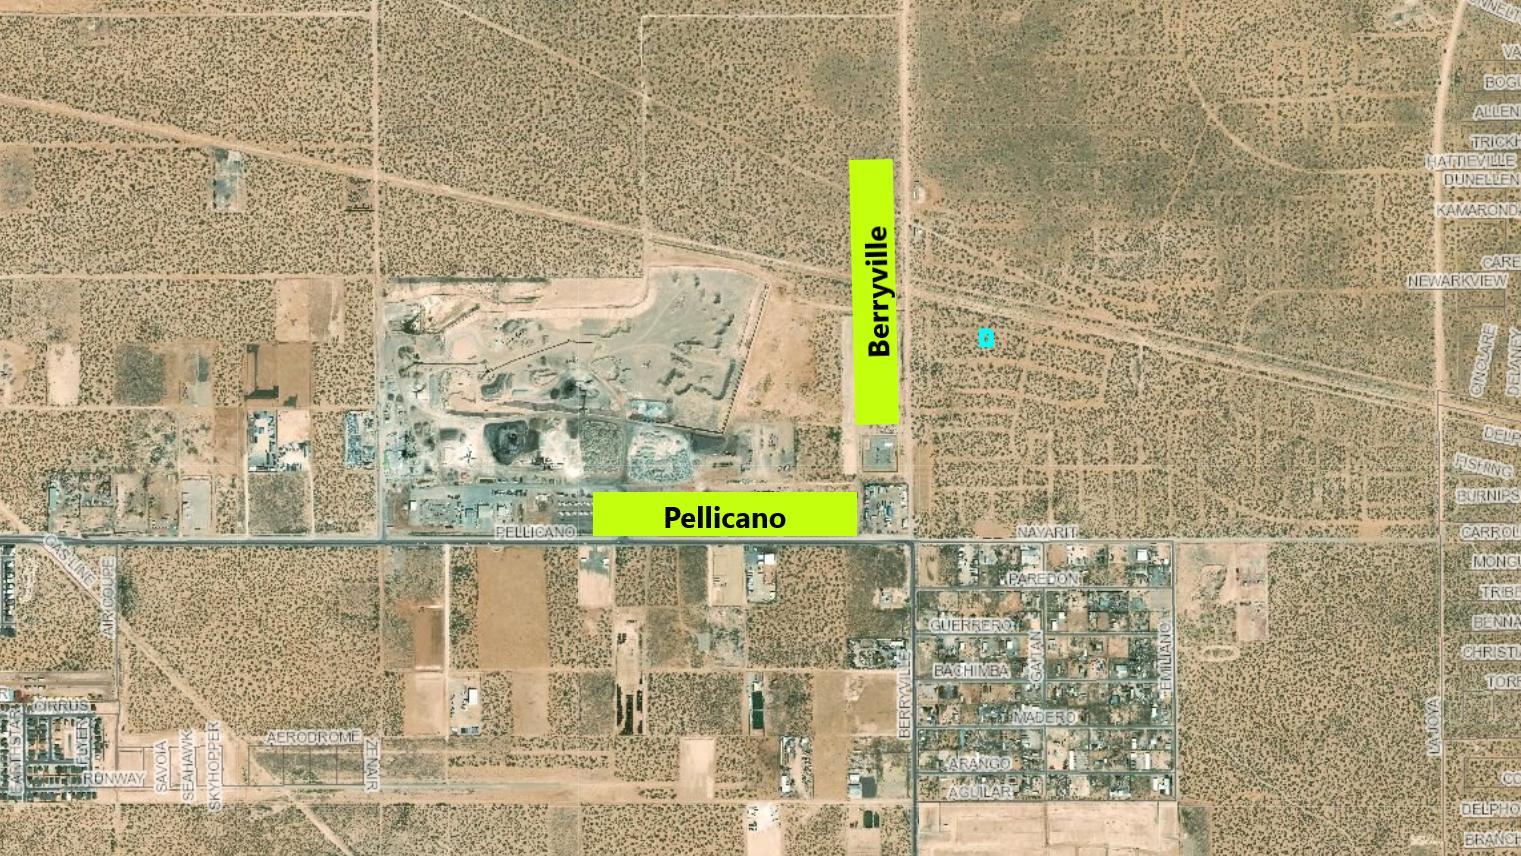 2 Palicano, Horizon City, Texas 79928, ,Land,For sale,Palicano,832756